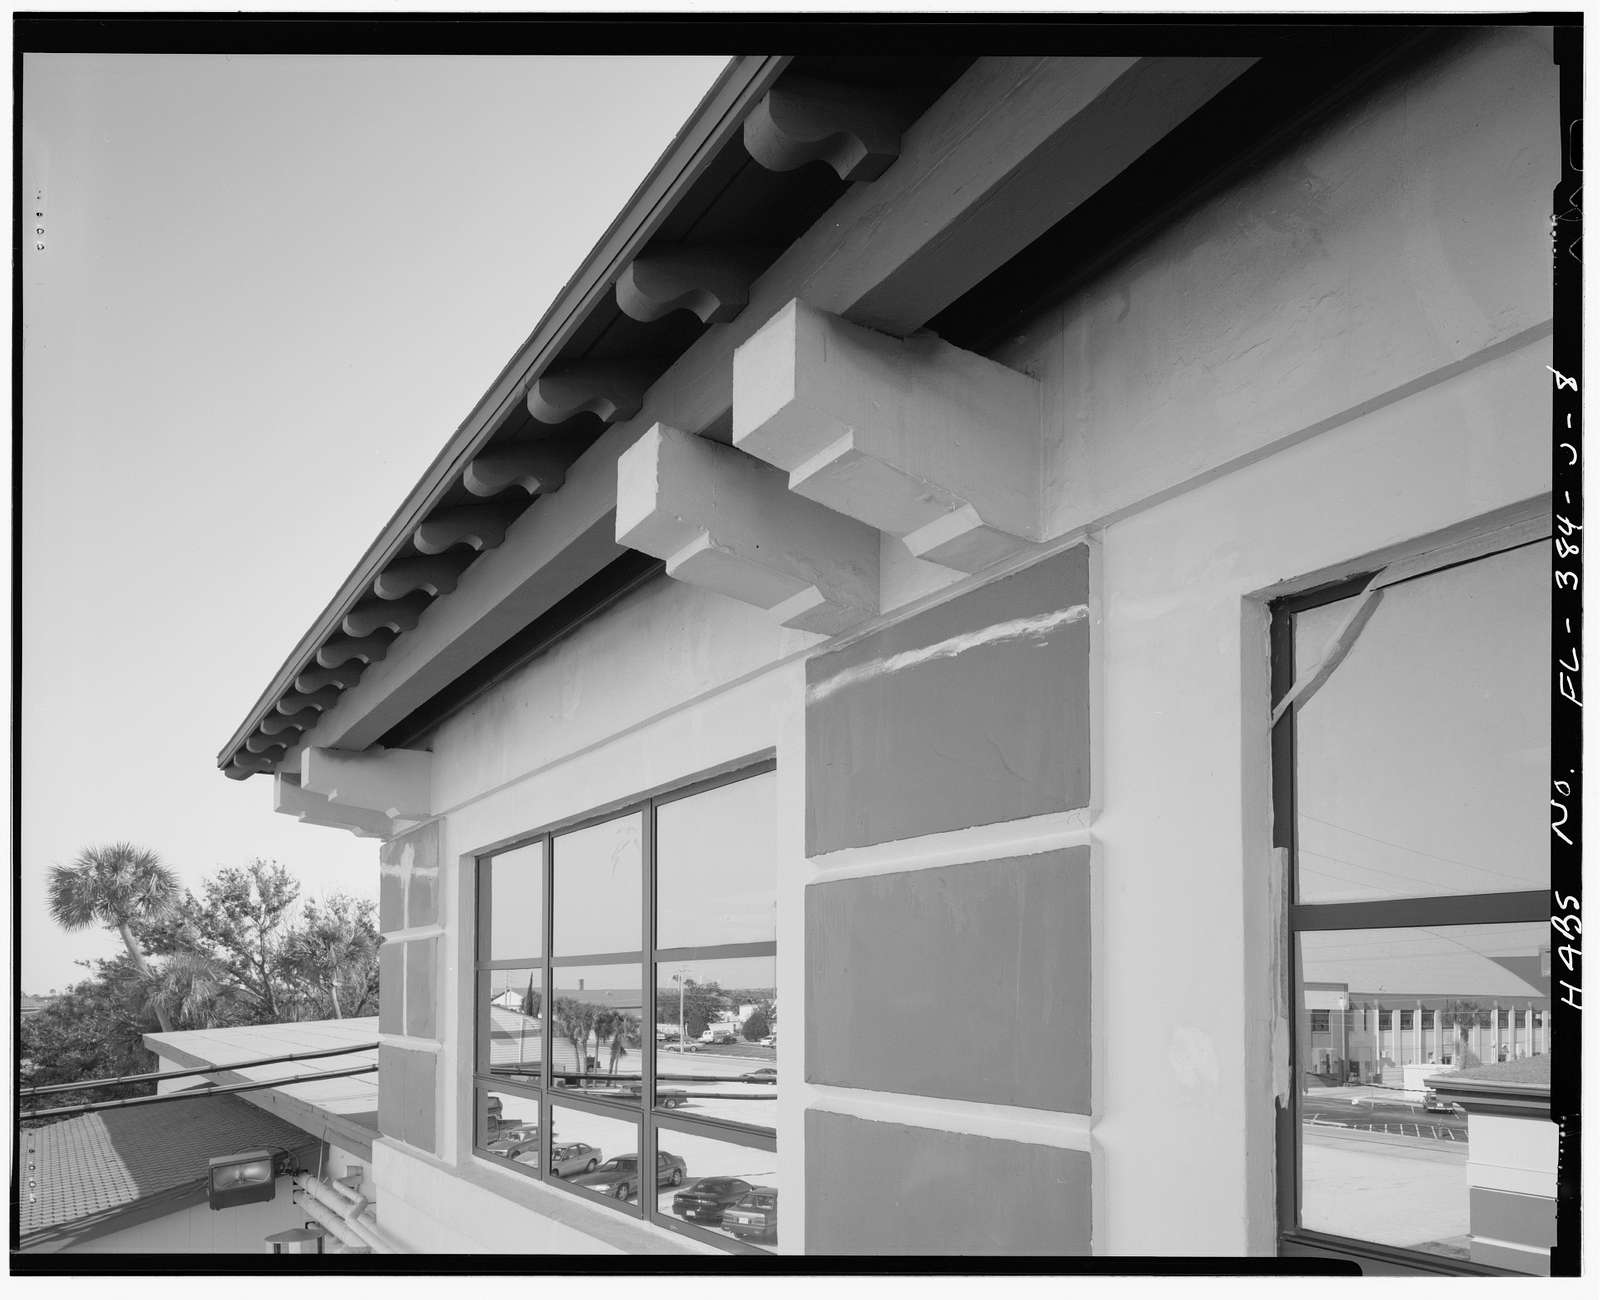 MacDill Air Force Base, Quartermaster Warehouse & Commissary, 7621 Hillsborough Loop Drive, Tampa, Hillsborough County, FL